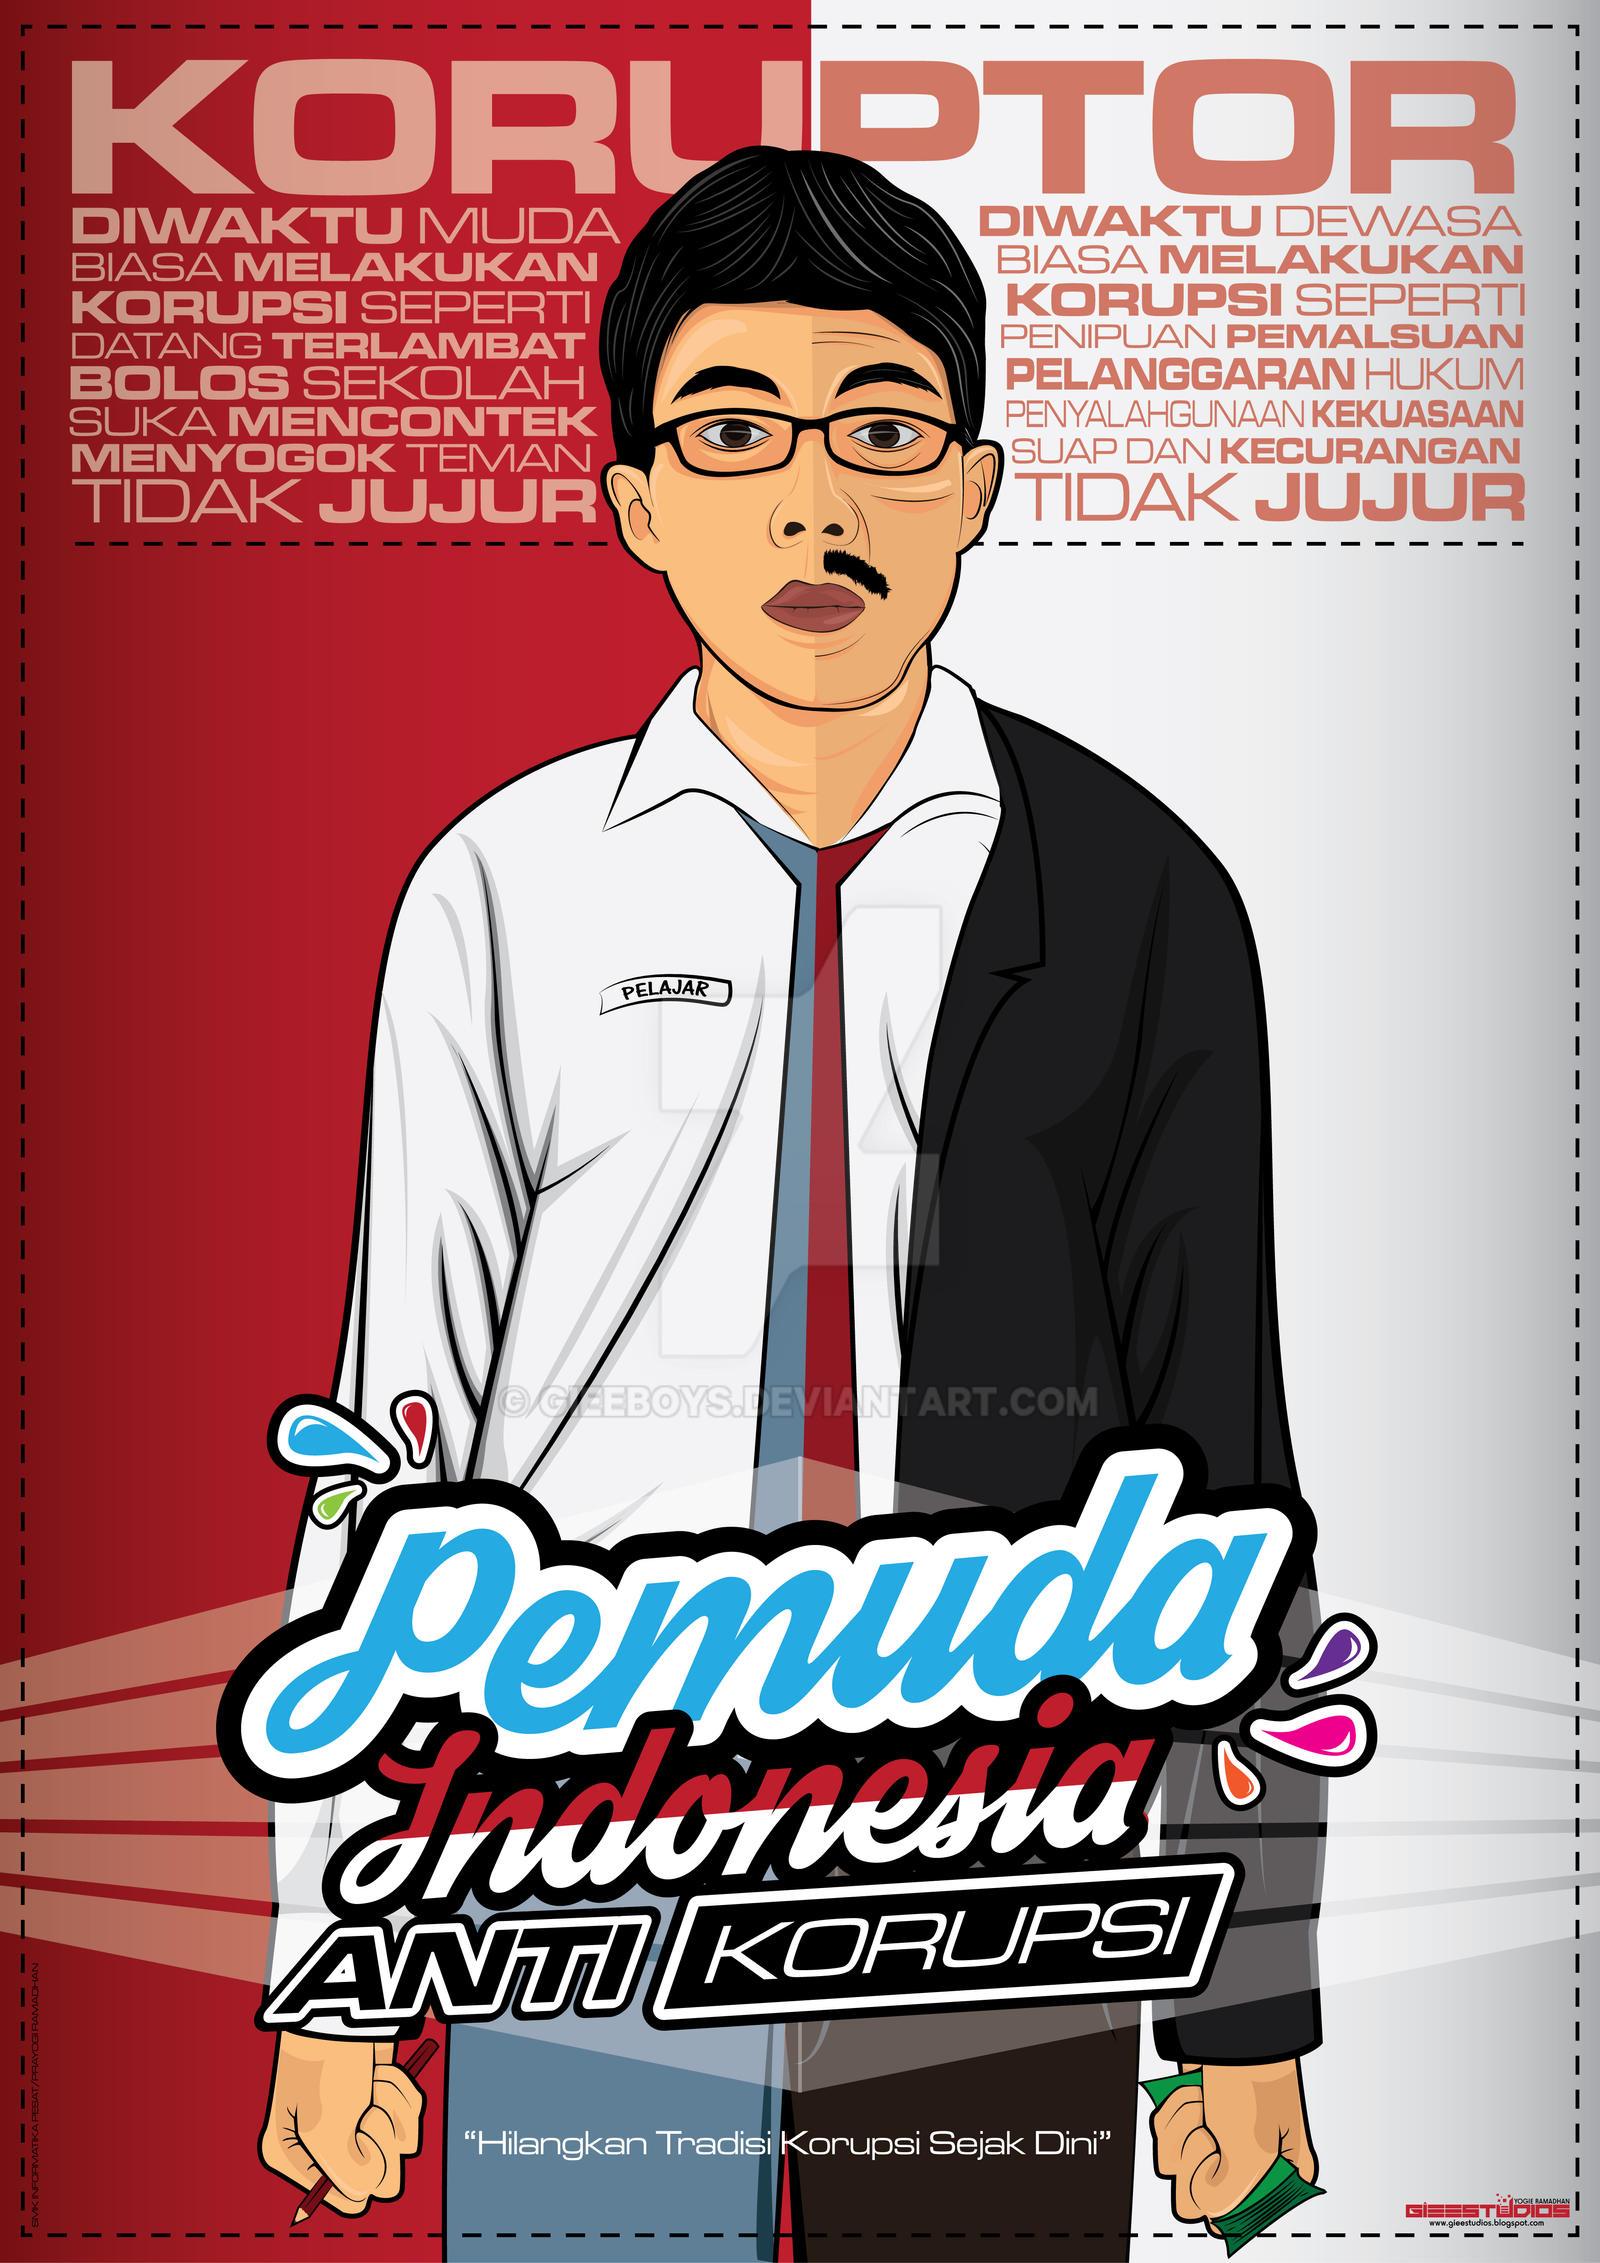 Poster Art Pemuda Anti Korupsi Indonesia By Gieeboys On Deviantart